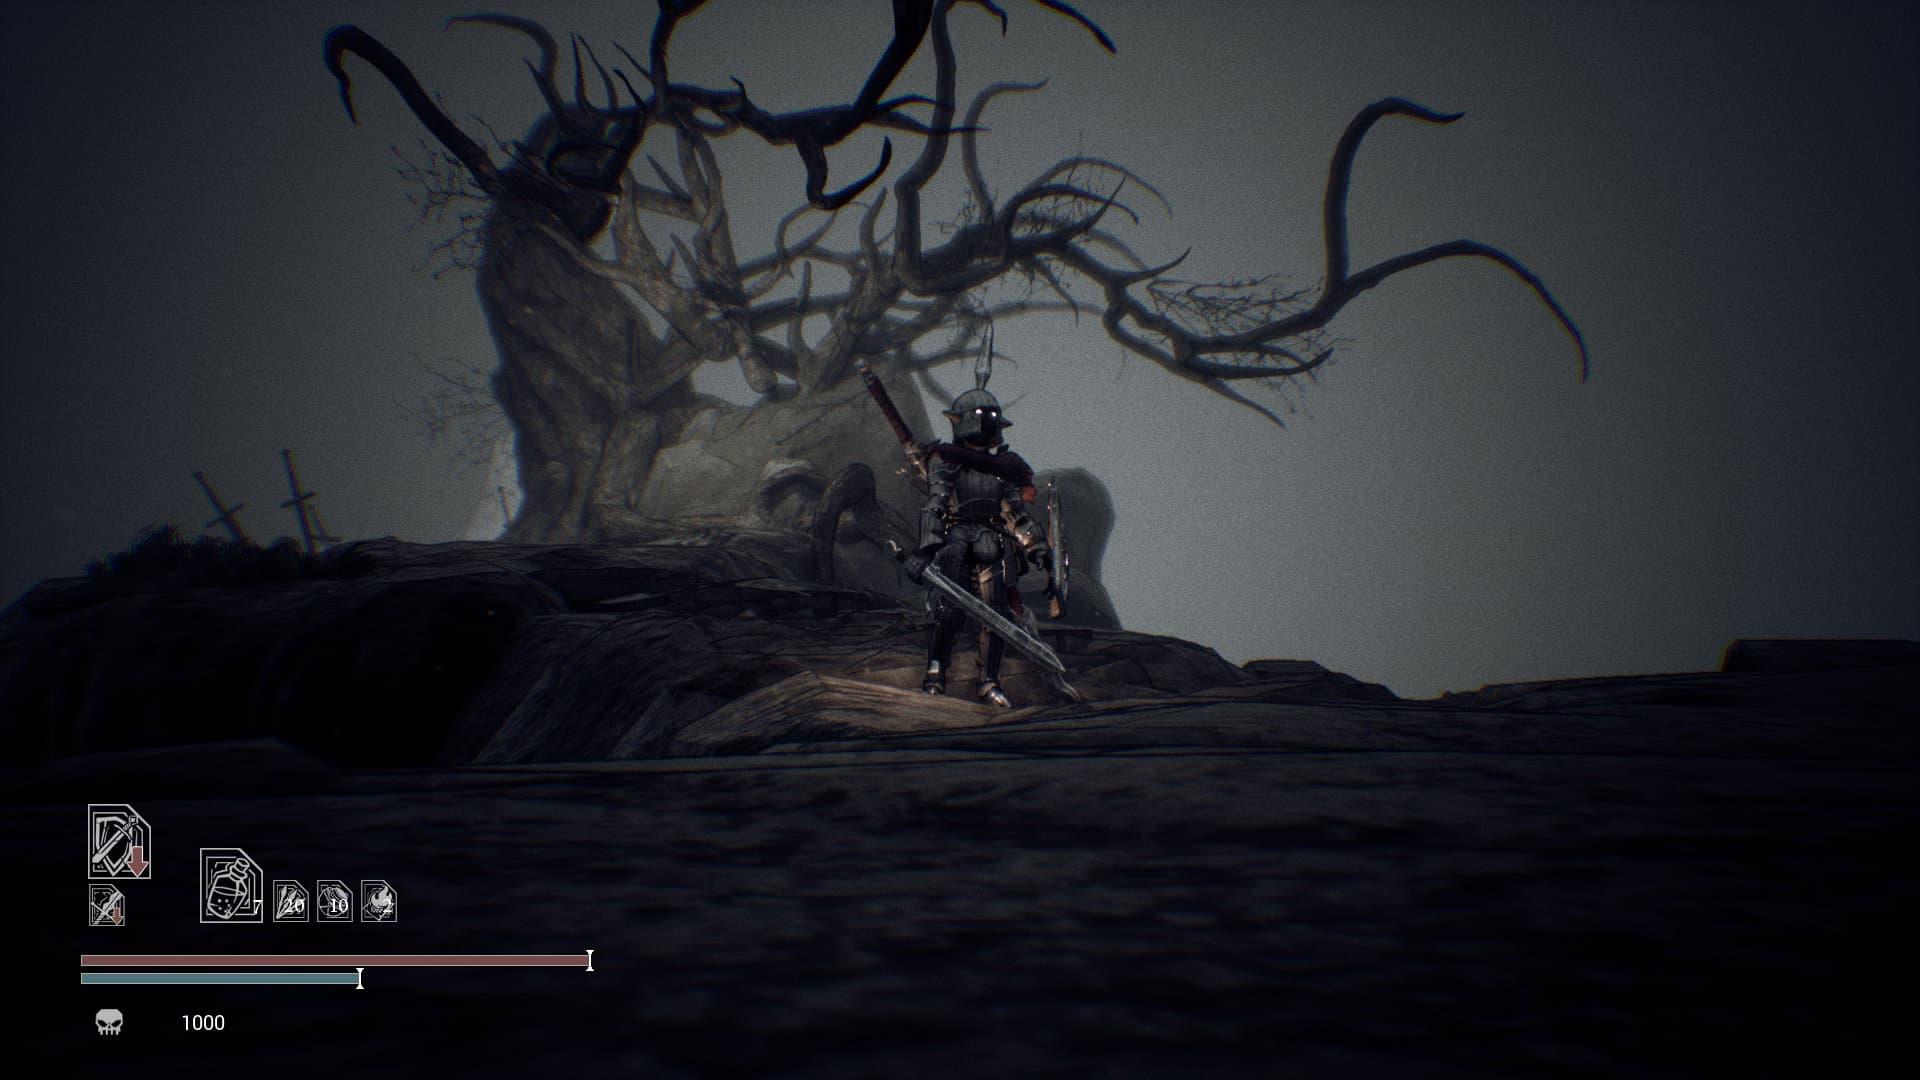 Sinner: Sacrifice for Redemption Xbox One